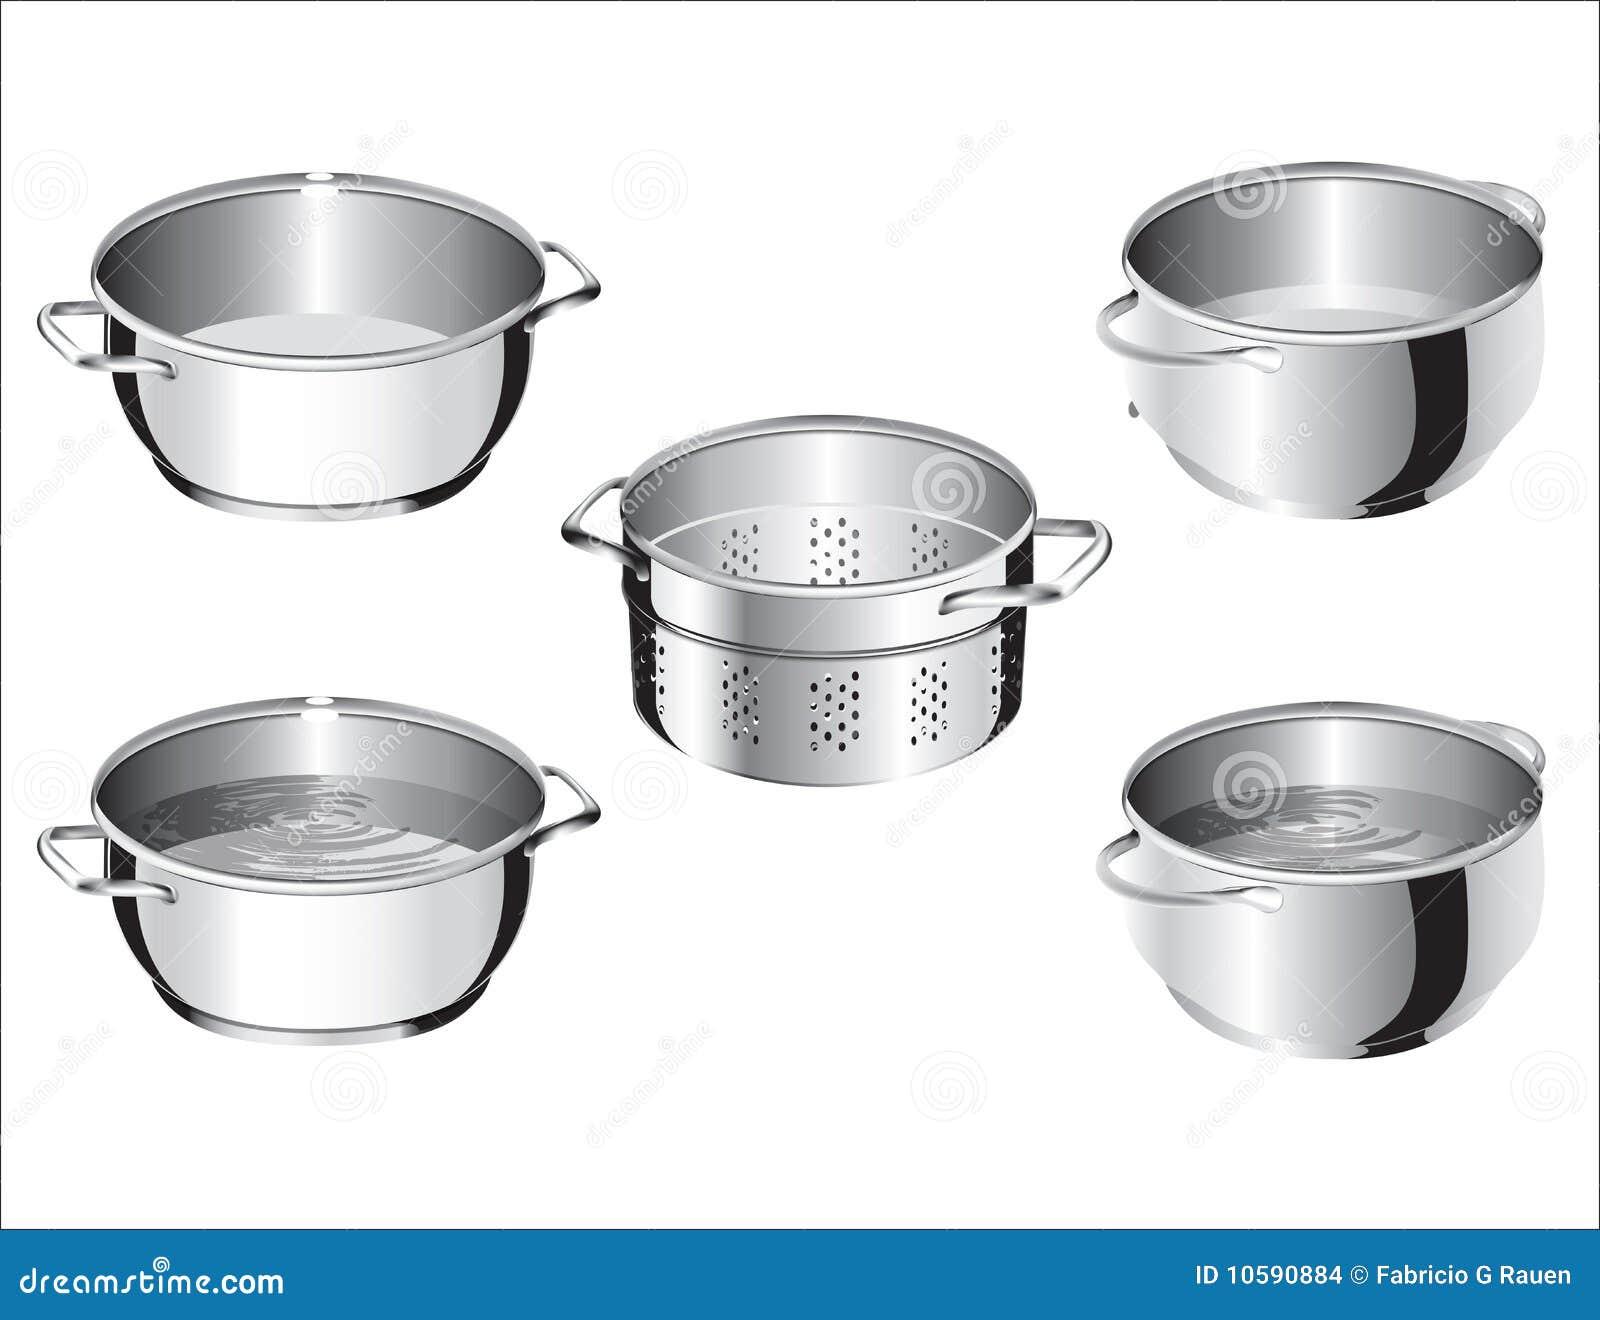 stainless steel cook pans stock images image 10590884. Black Bedroom Furniture Sets. Home Design Ideas